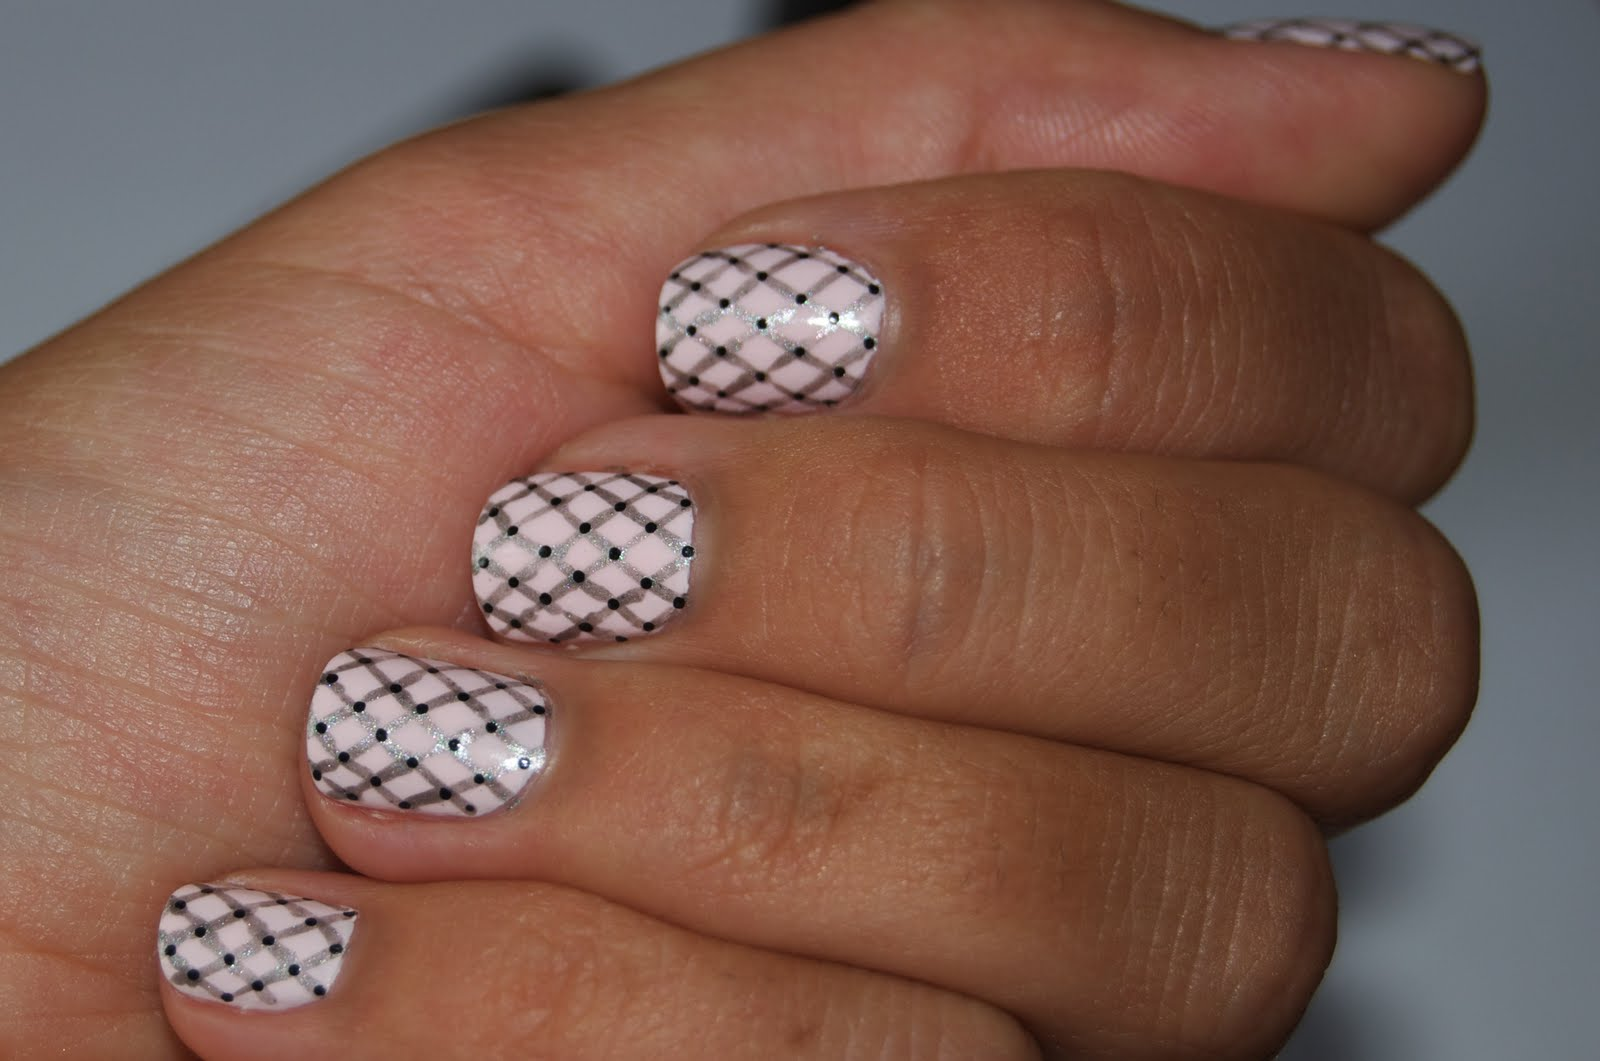 Nail Art Ideas Criss Cross Maryam Maquillage Ballet Fishnets